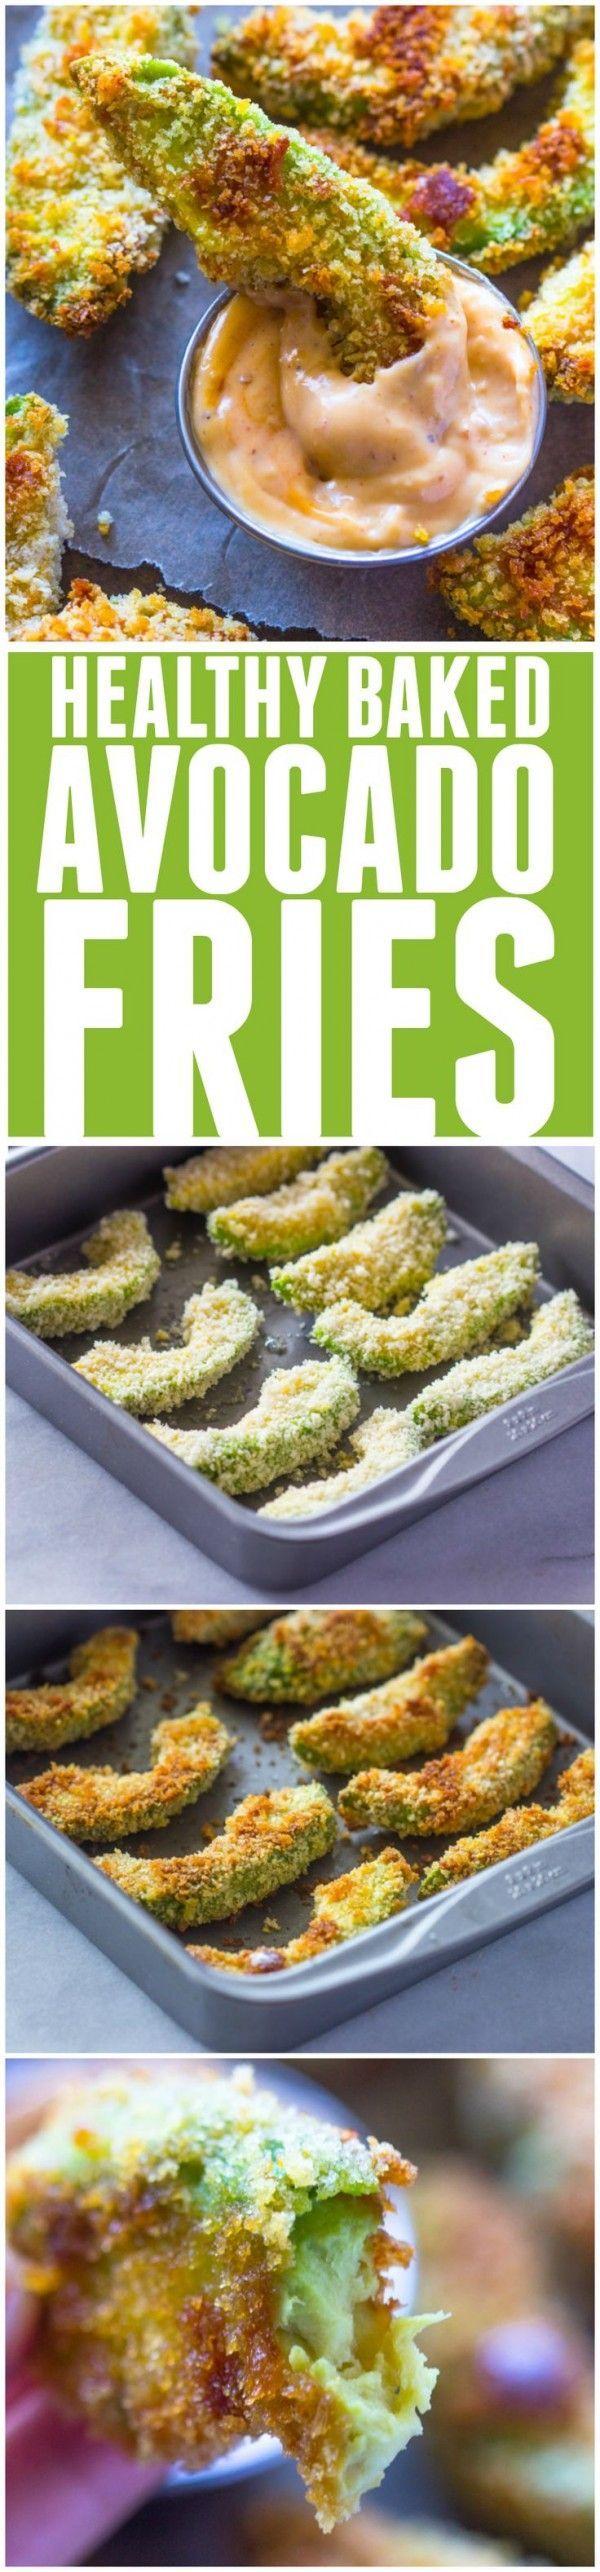 Get the recipe :hearts: Baked Avocado Fries /recipes_to_go/